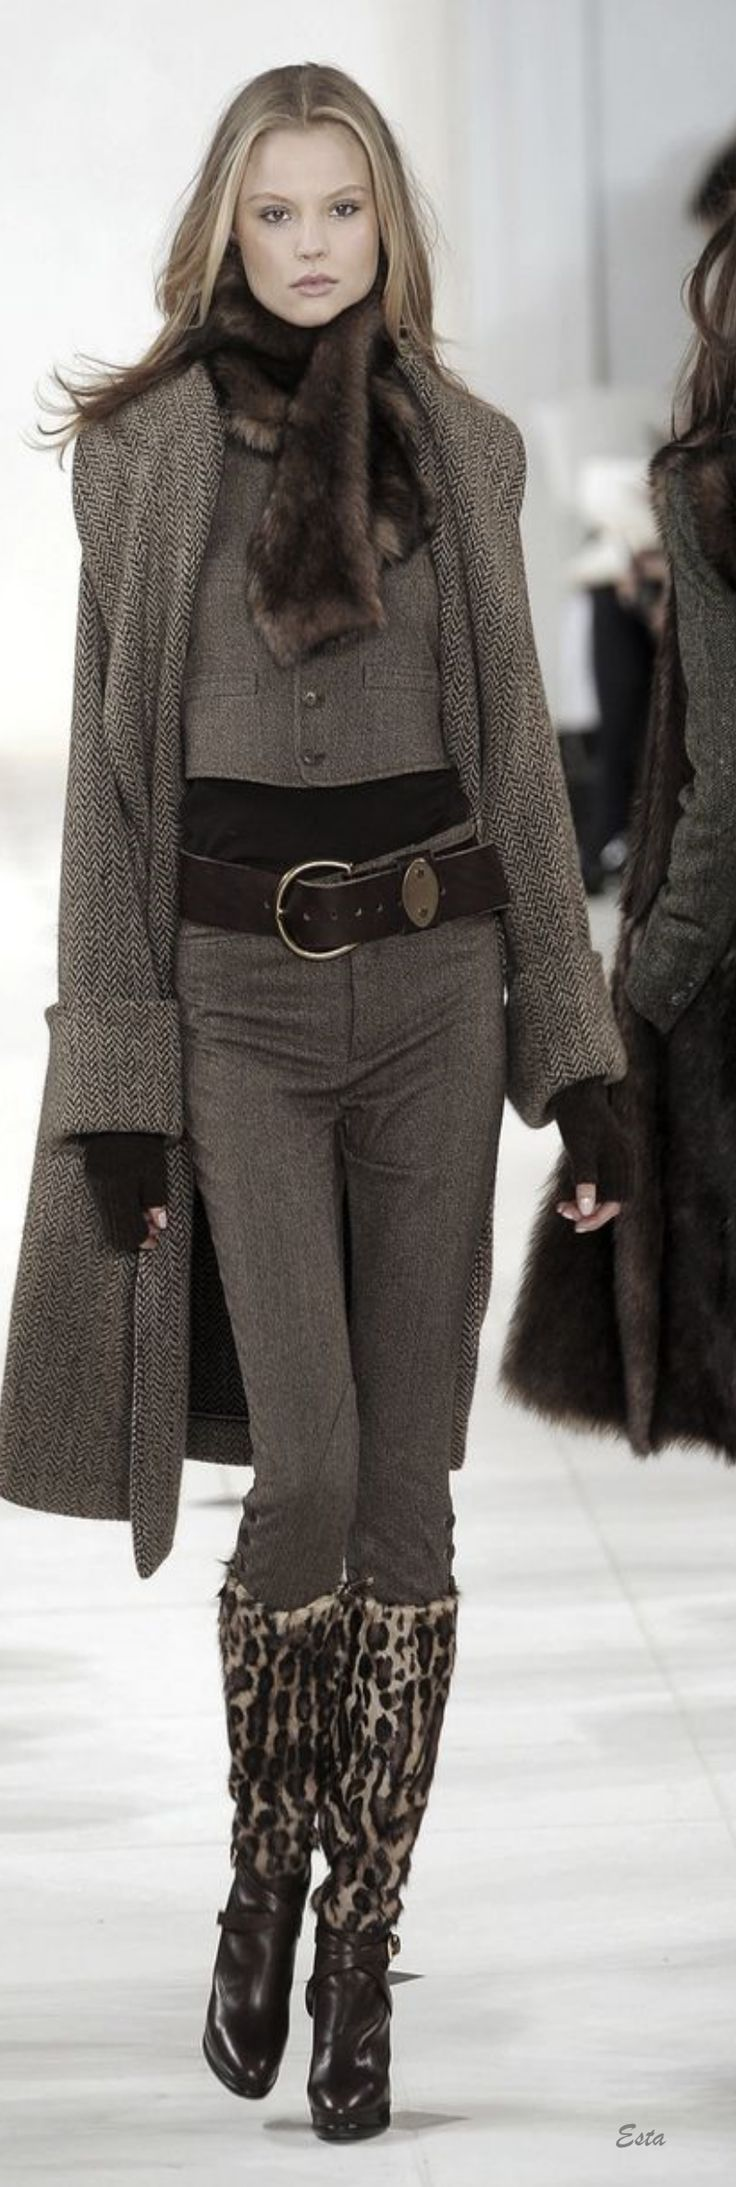 Ralph Lauren • Fall • Winter  • Street CHIC • ❤️ вαвz ✿ιиѕριяαтισи❀ #abbigliamento